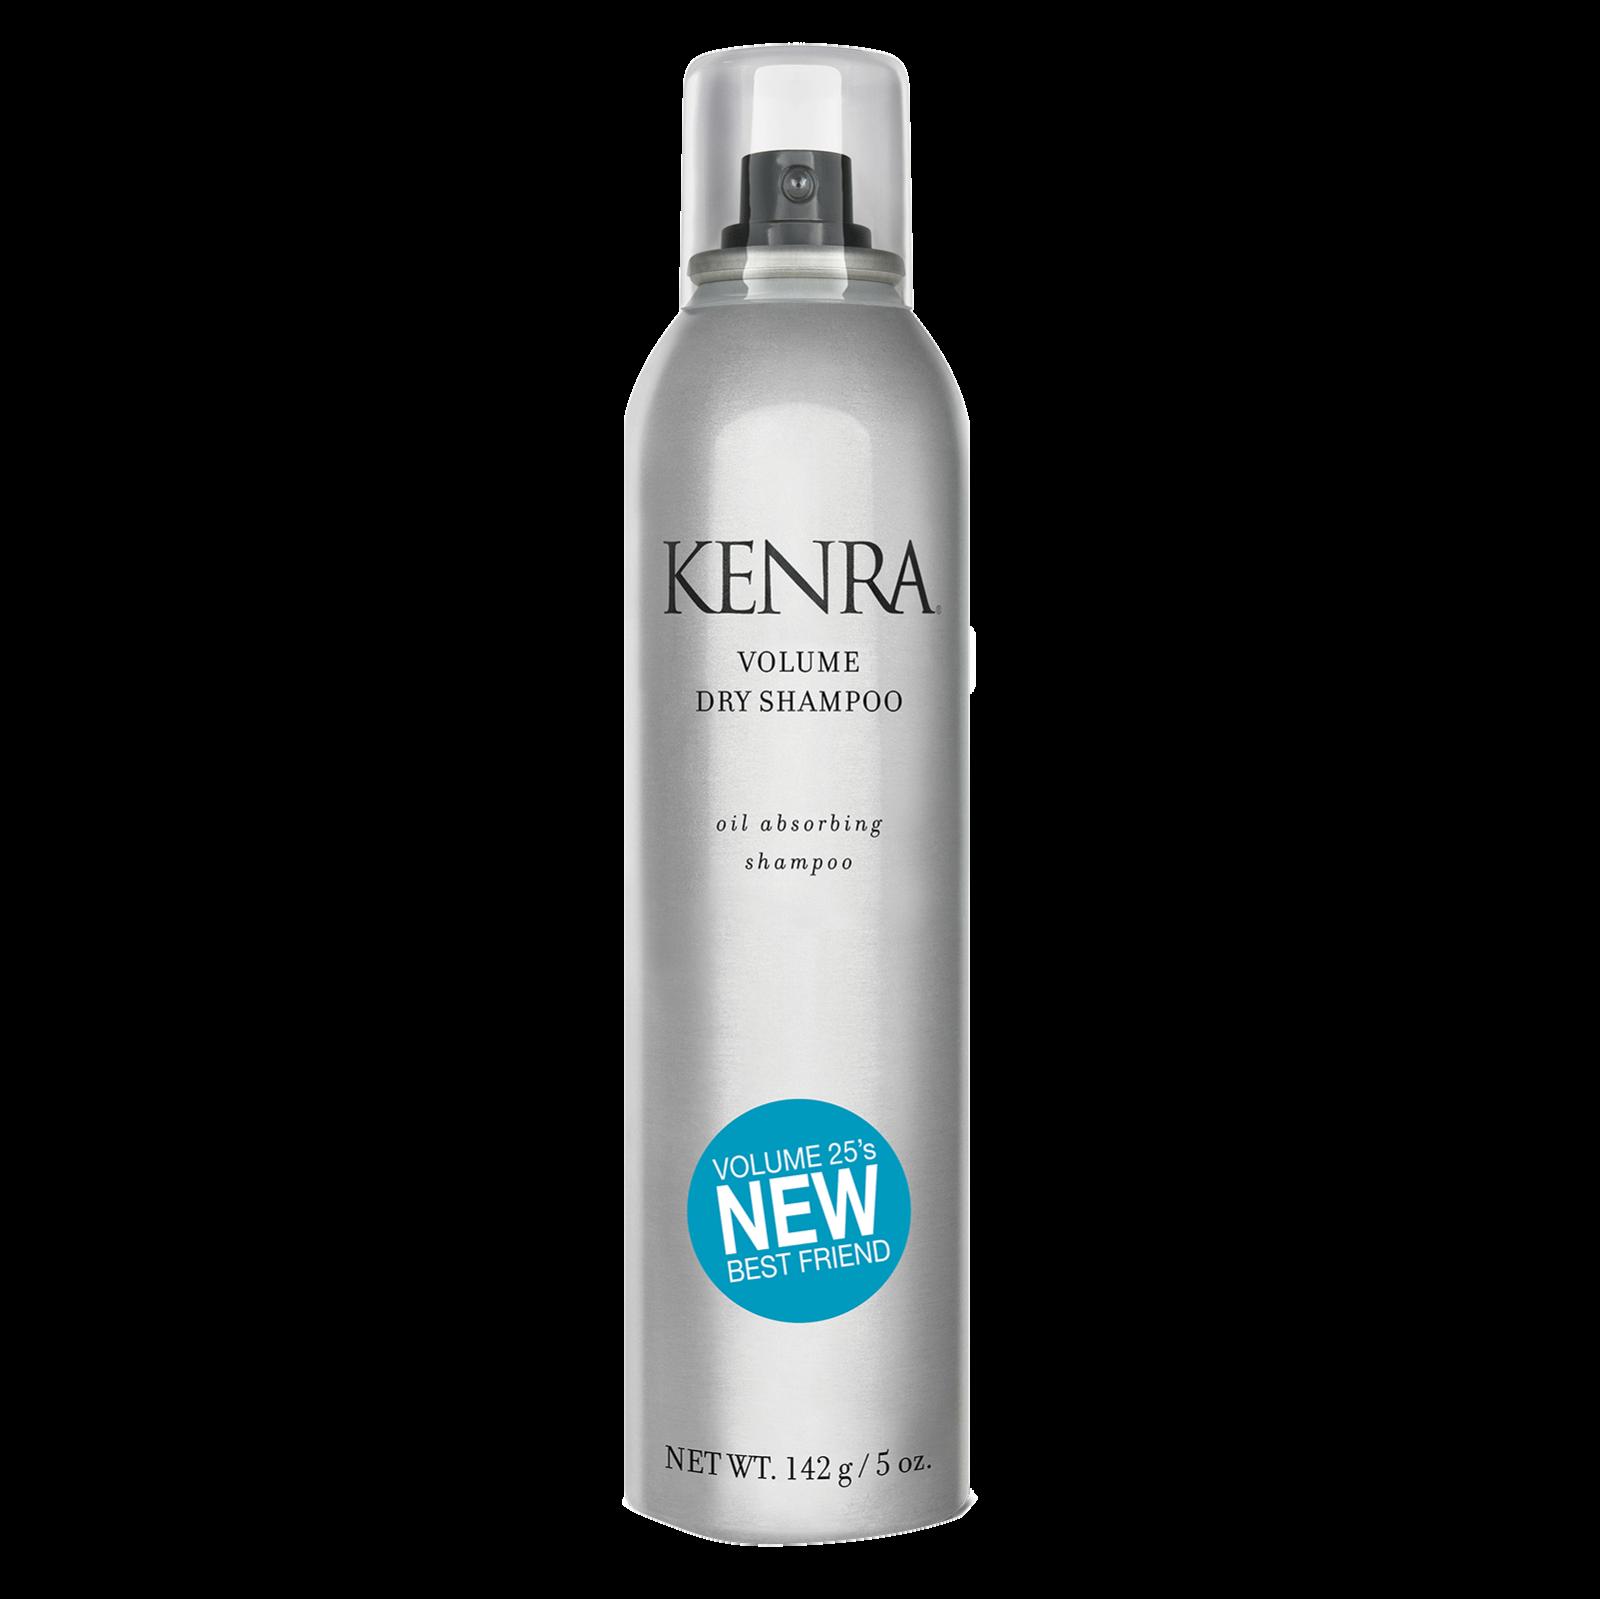 Kenra Volume Dry Shampoo 5oz